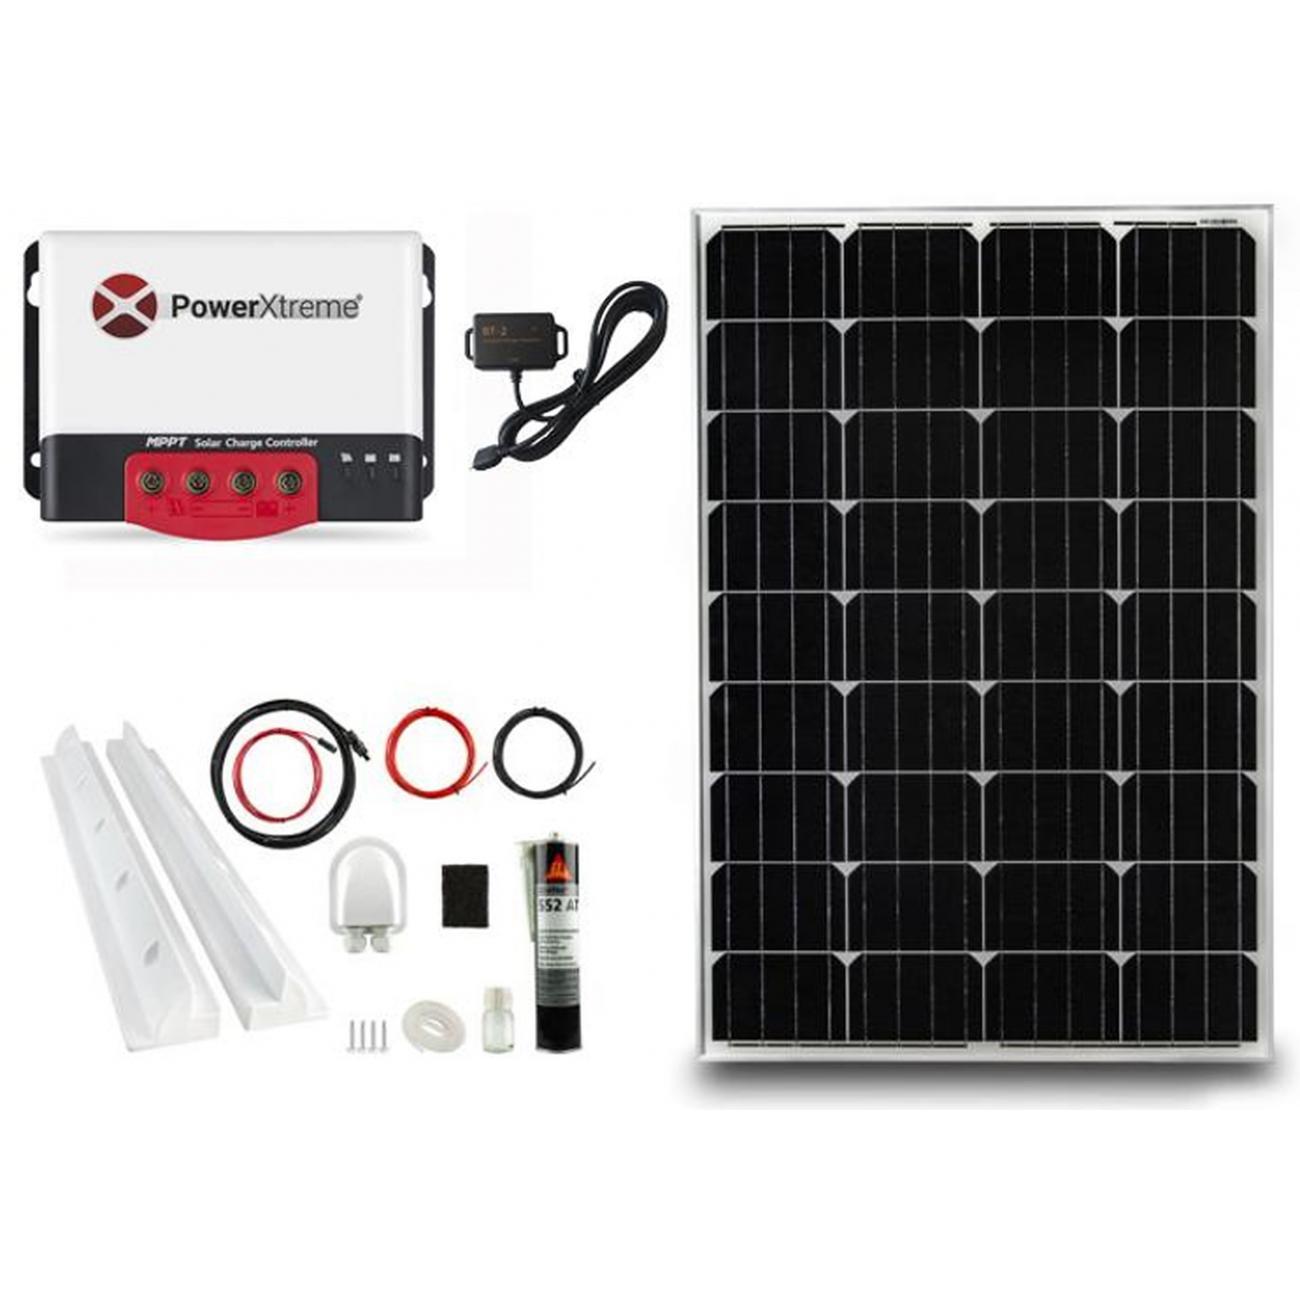 MPPT Solarladeregler PowerXtreme XS20s Mit Bluetooth 130W-Paket